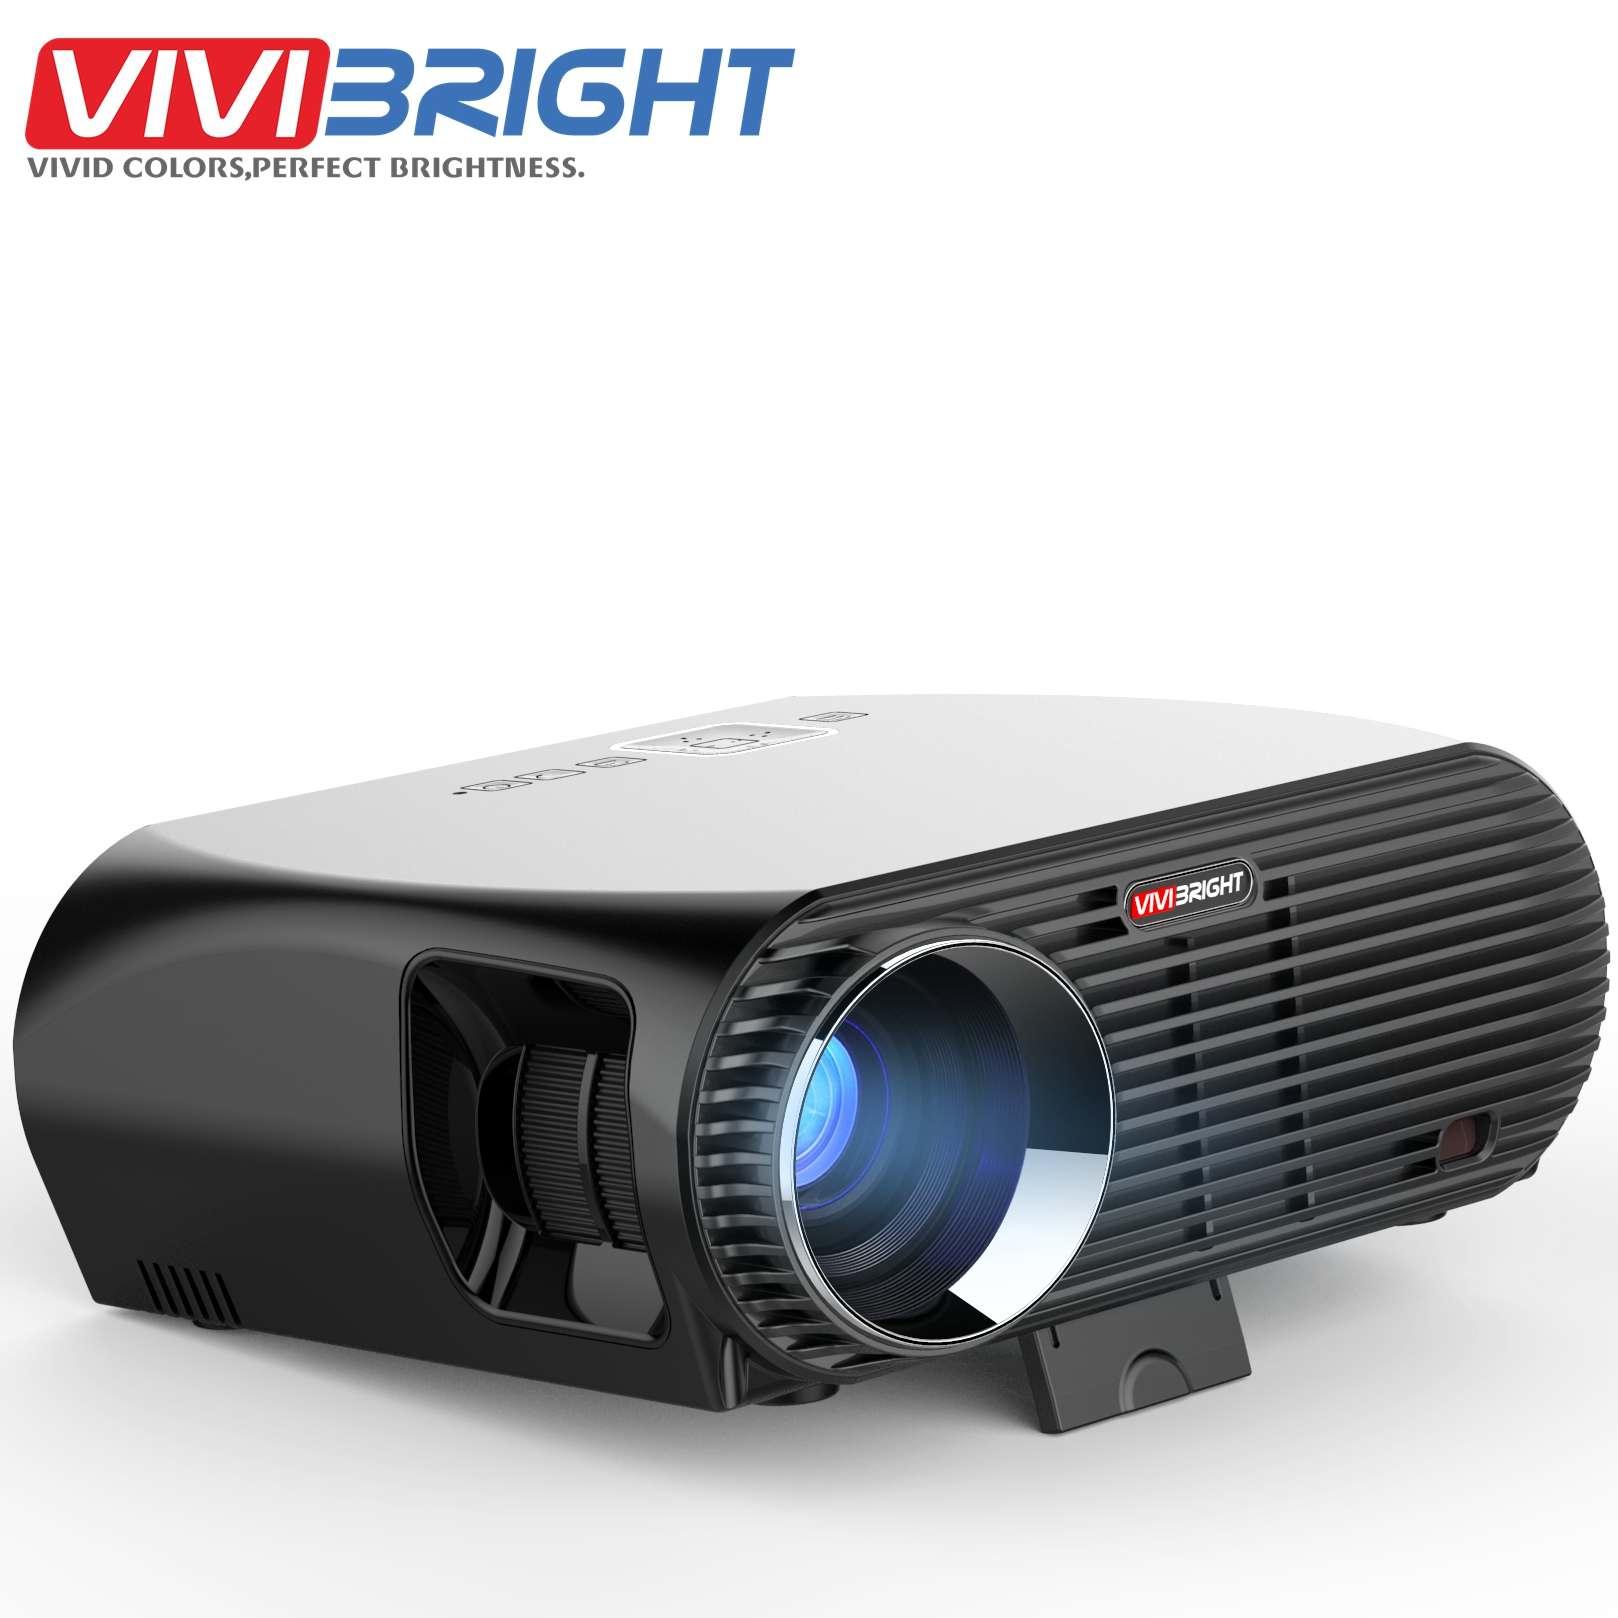 Vivibright GP100UP z systemem Android 6.01 WIFI inteligentne projektor LED 3500 lumenów 1280*800 p 1080 P HD kina domowego